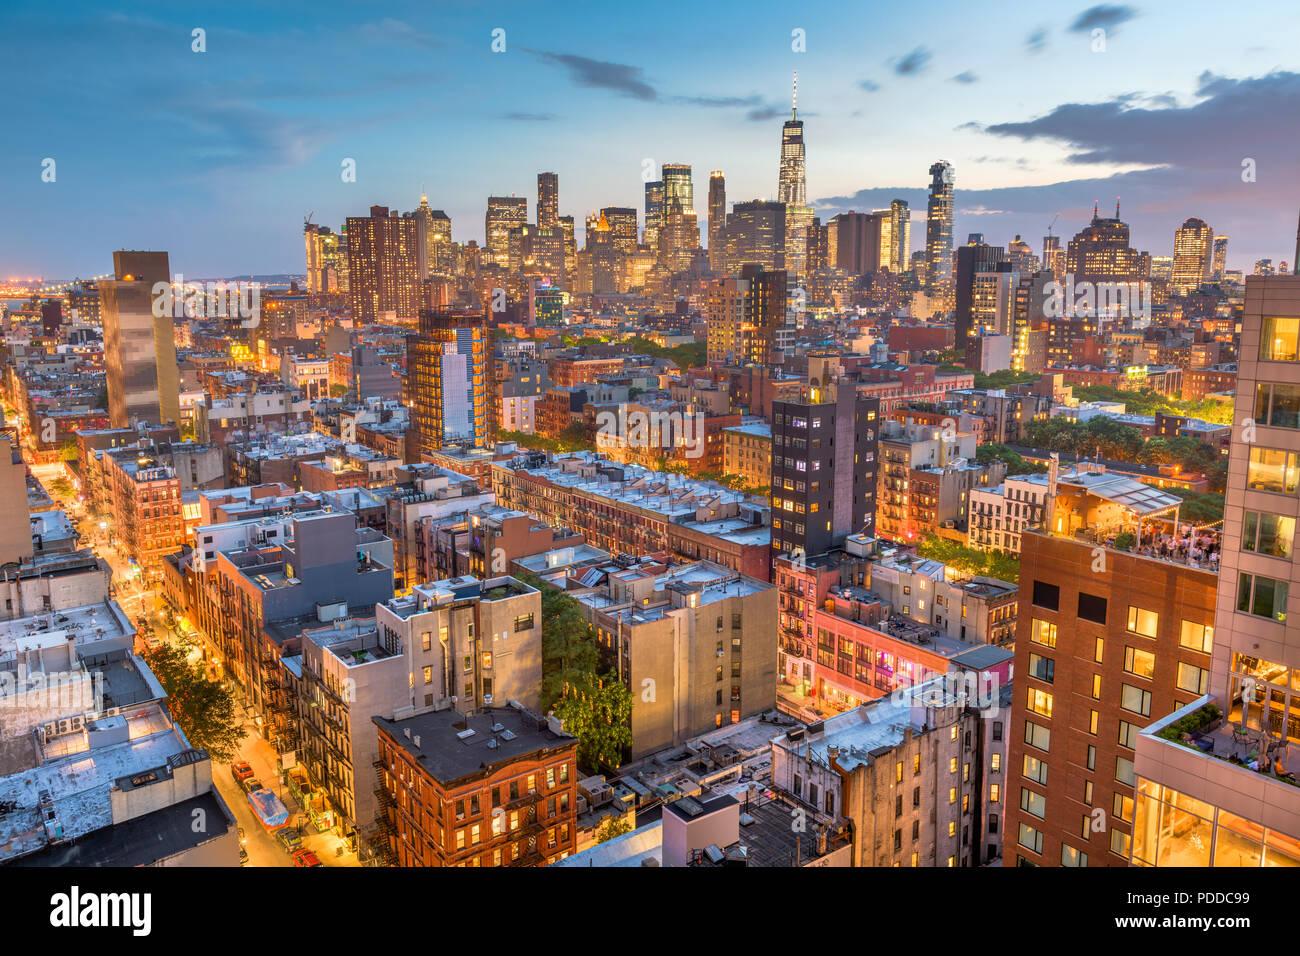 New York, New York, Stati Uniti d'America Financial District skyline da Lower East Side al crepuscolo. Immagini Stock